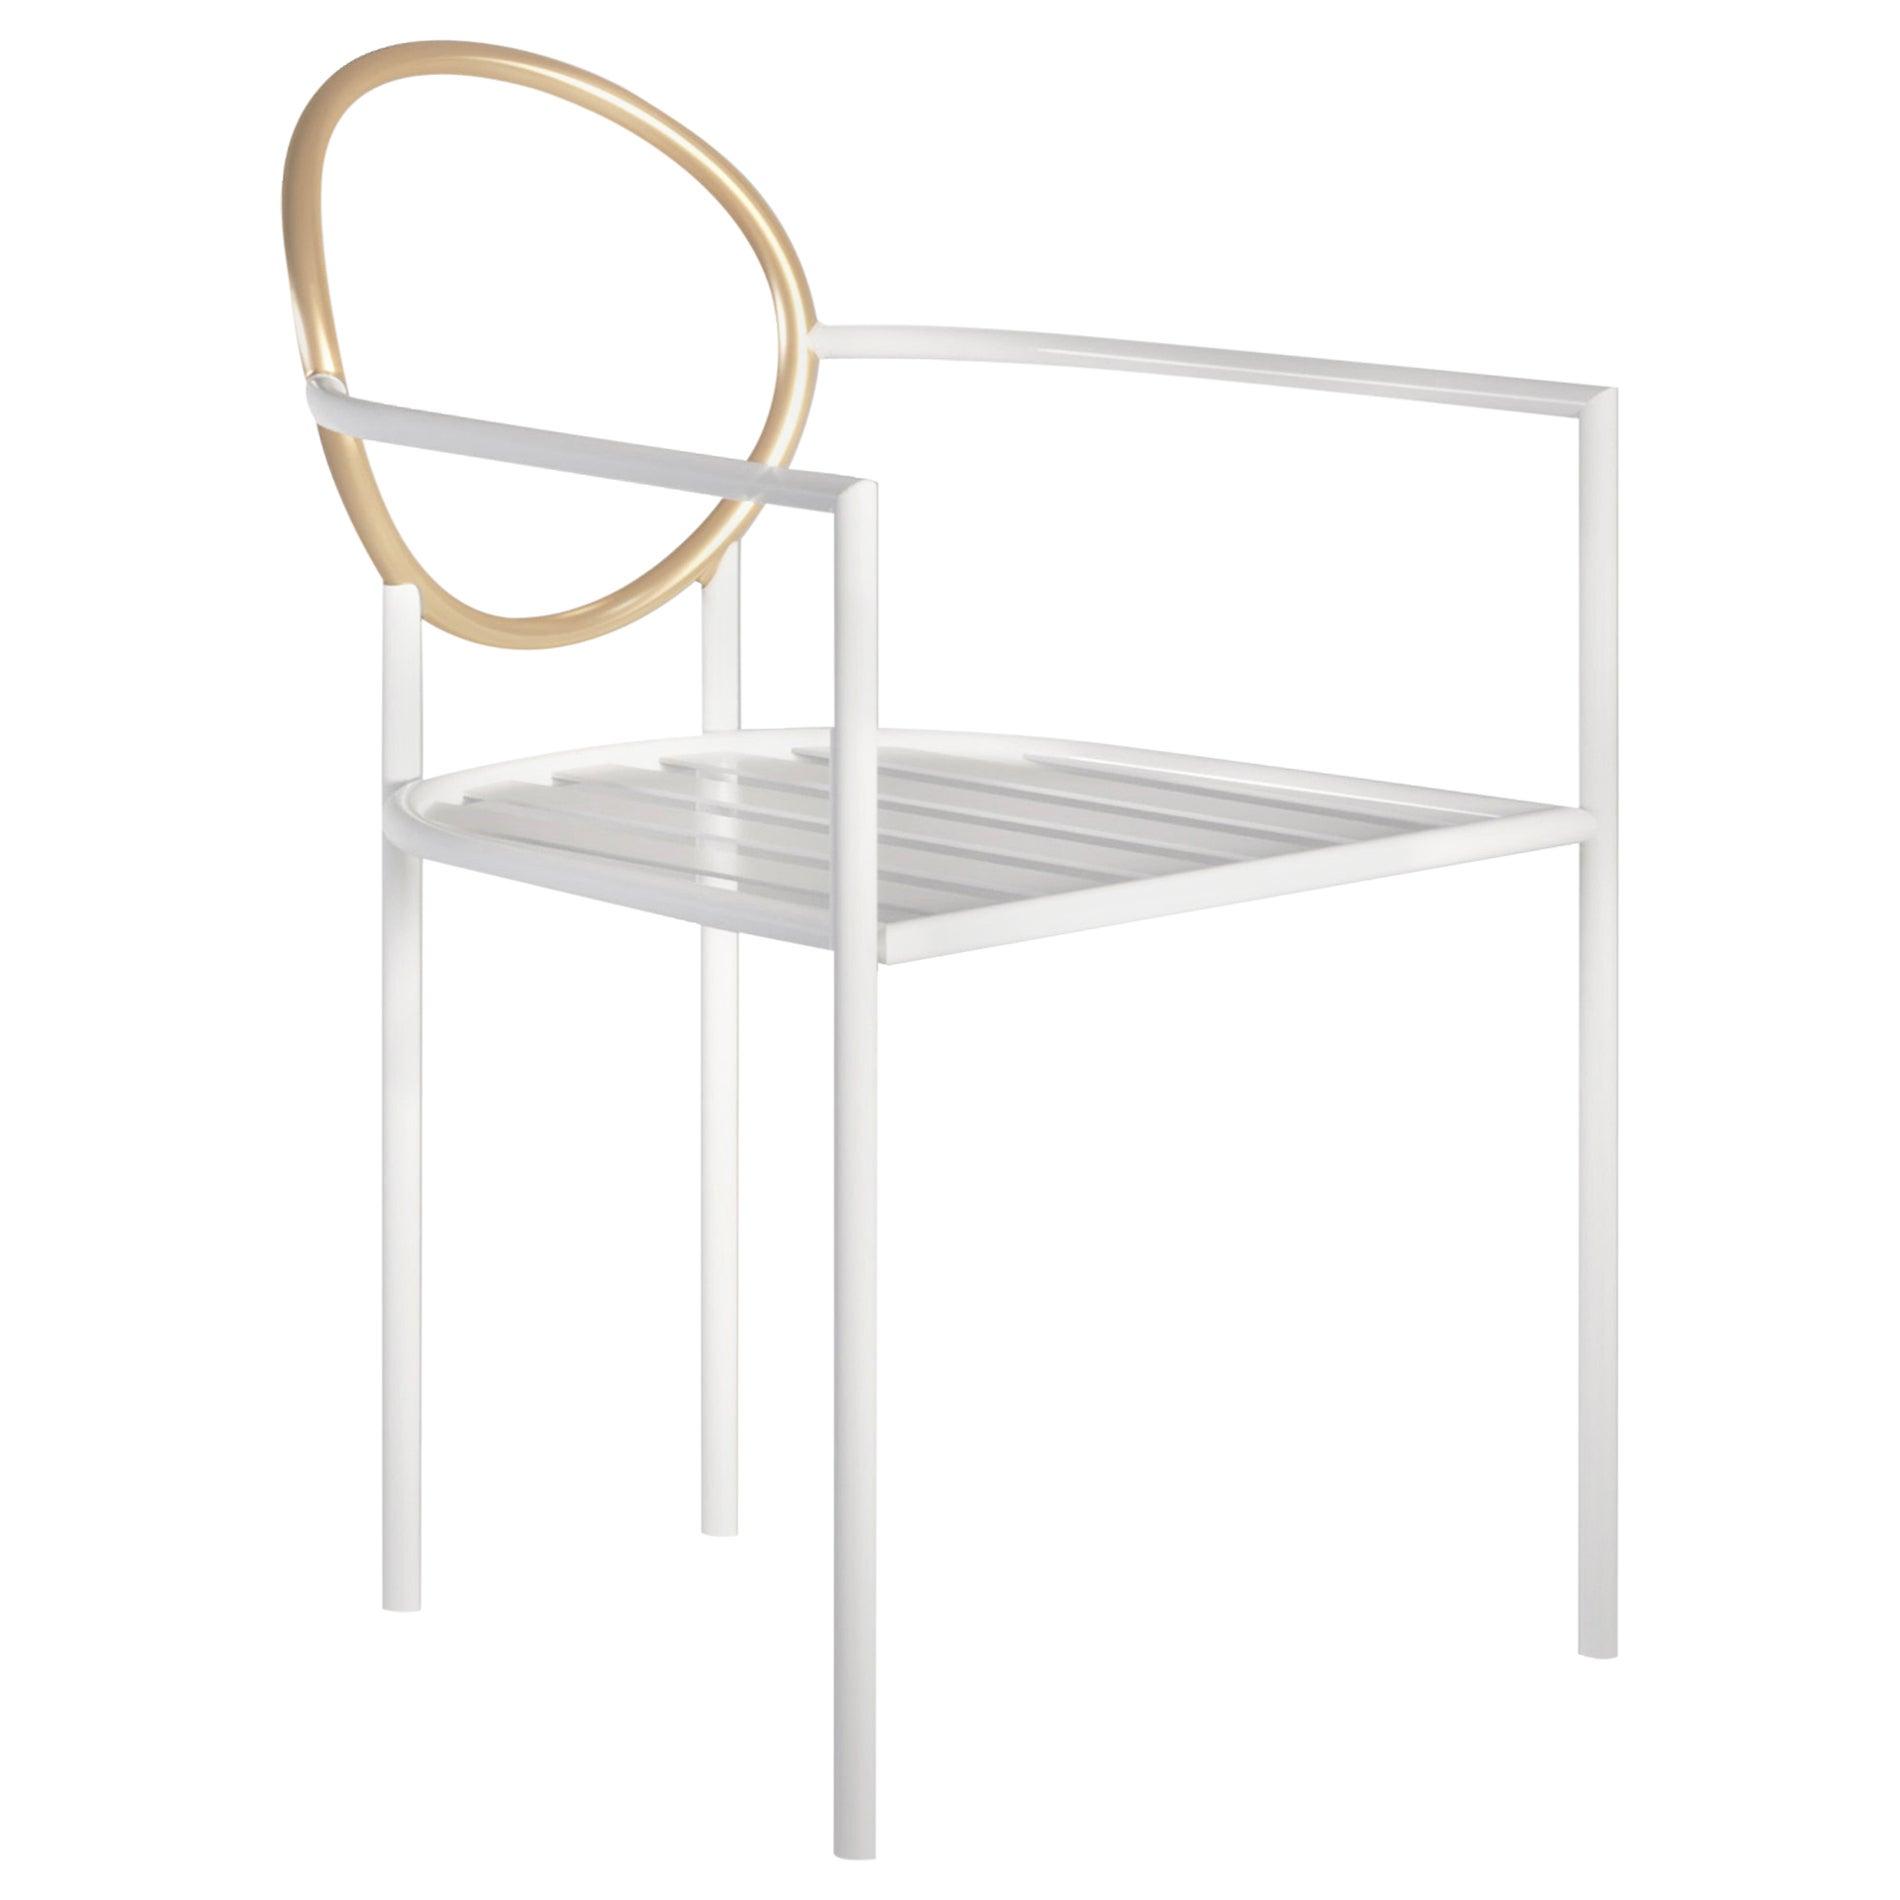 Halo Contemporary Outdoor Chair in Aluminium by Artefatto Design Studio